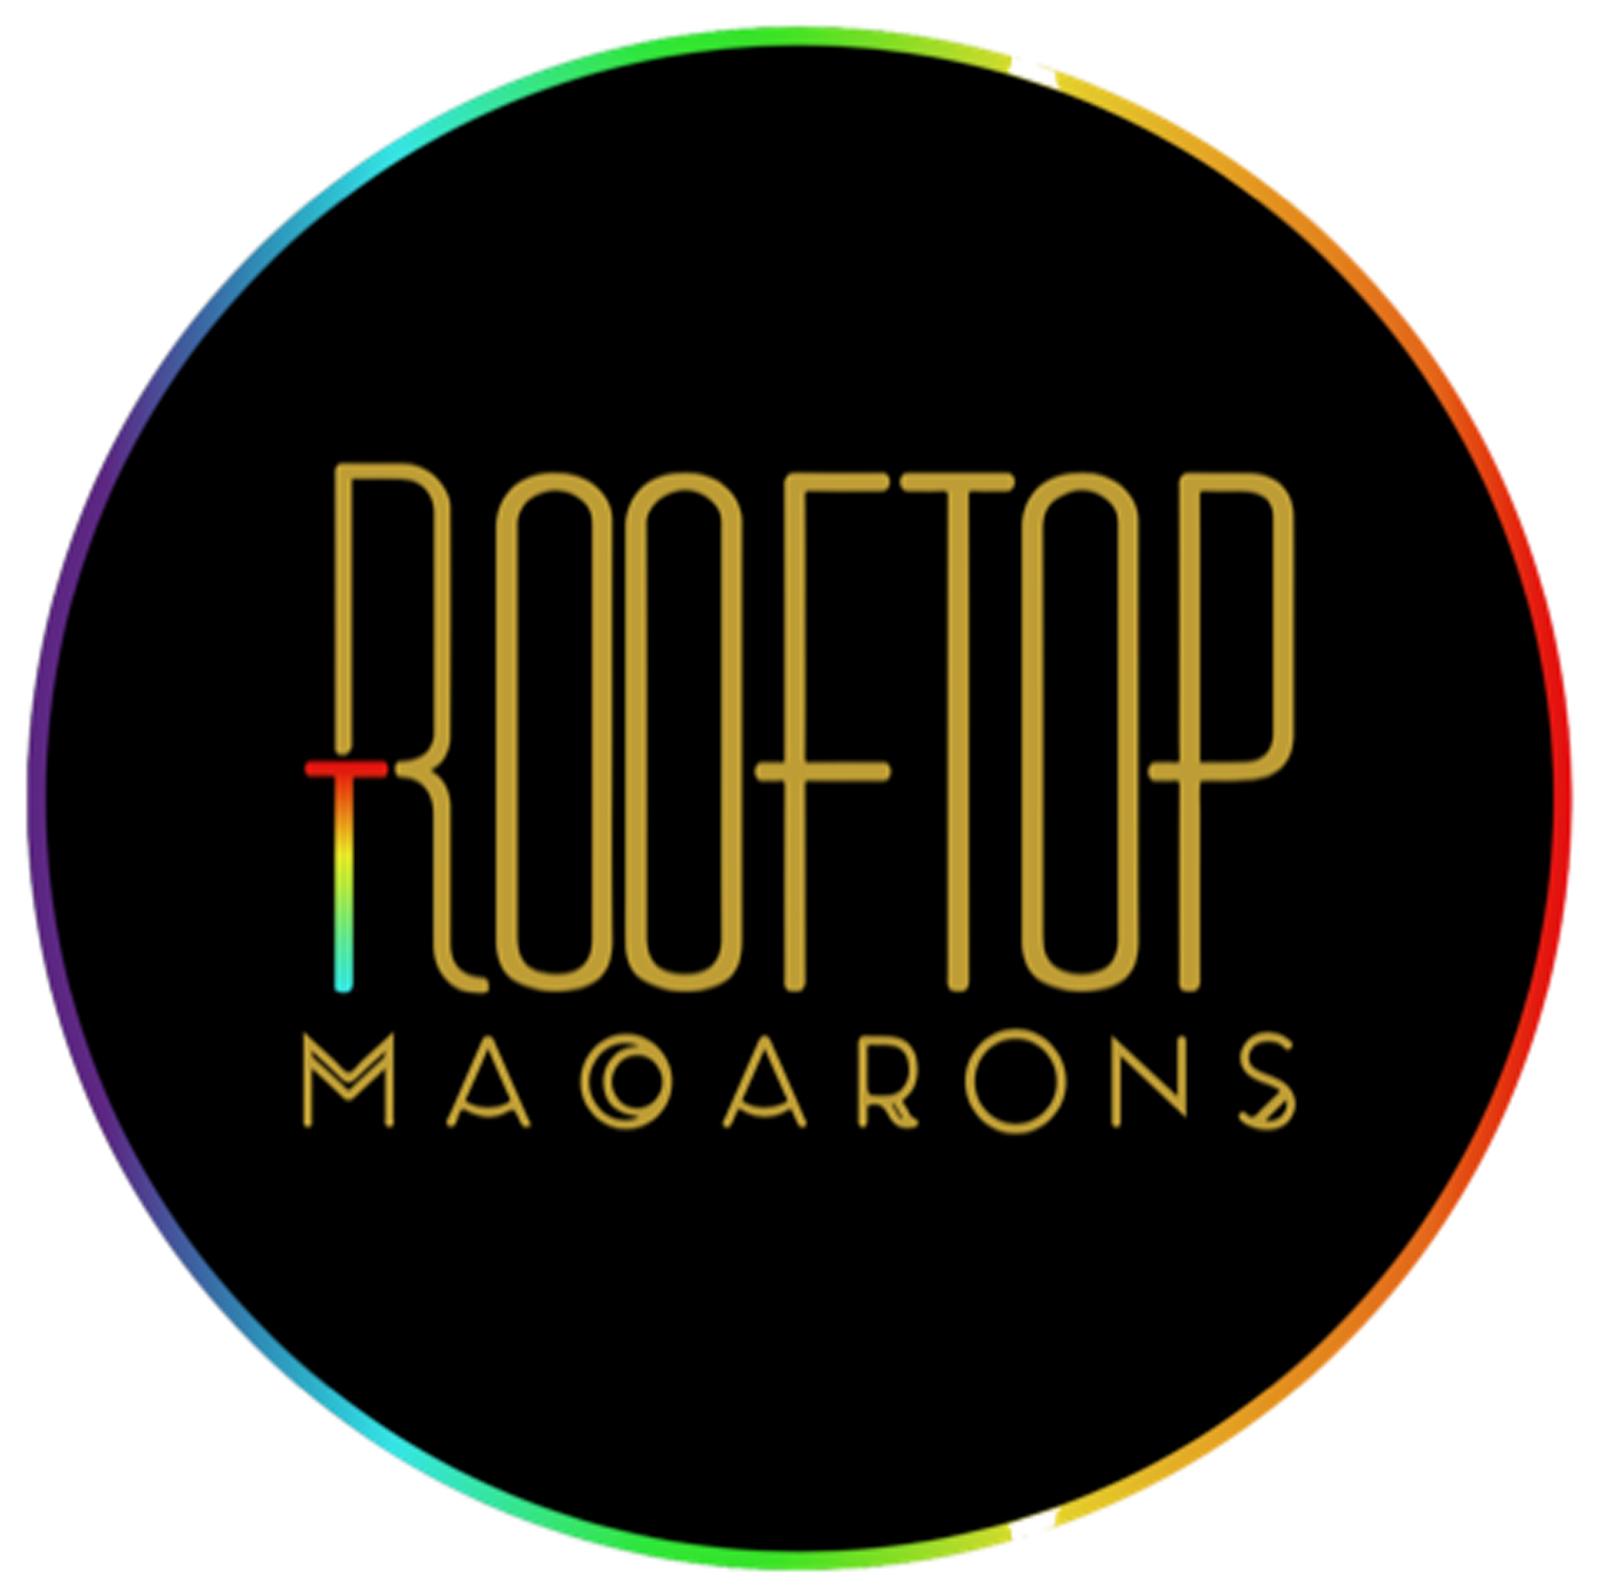 Rooftop Macarons